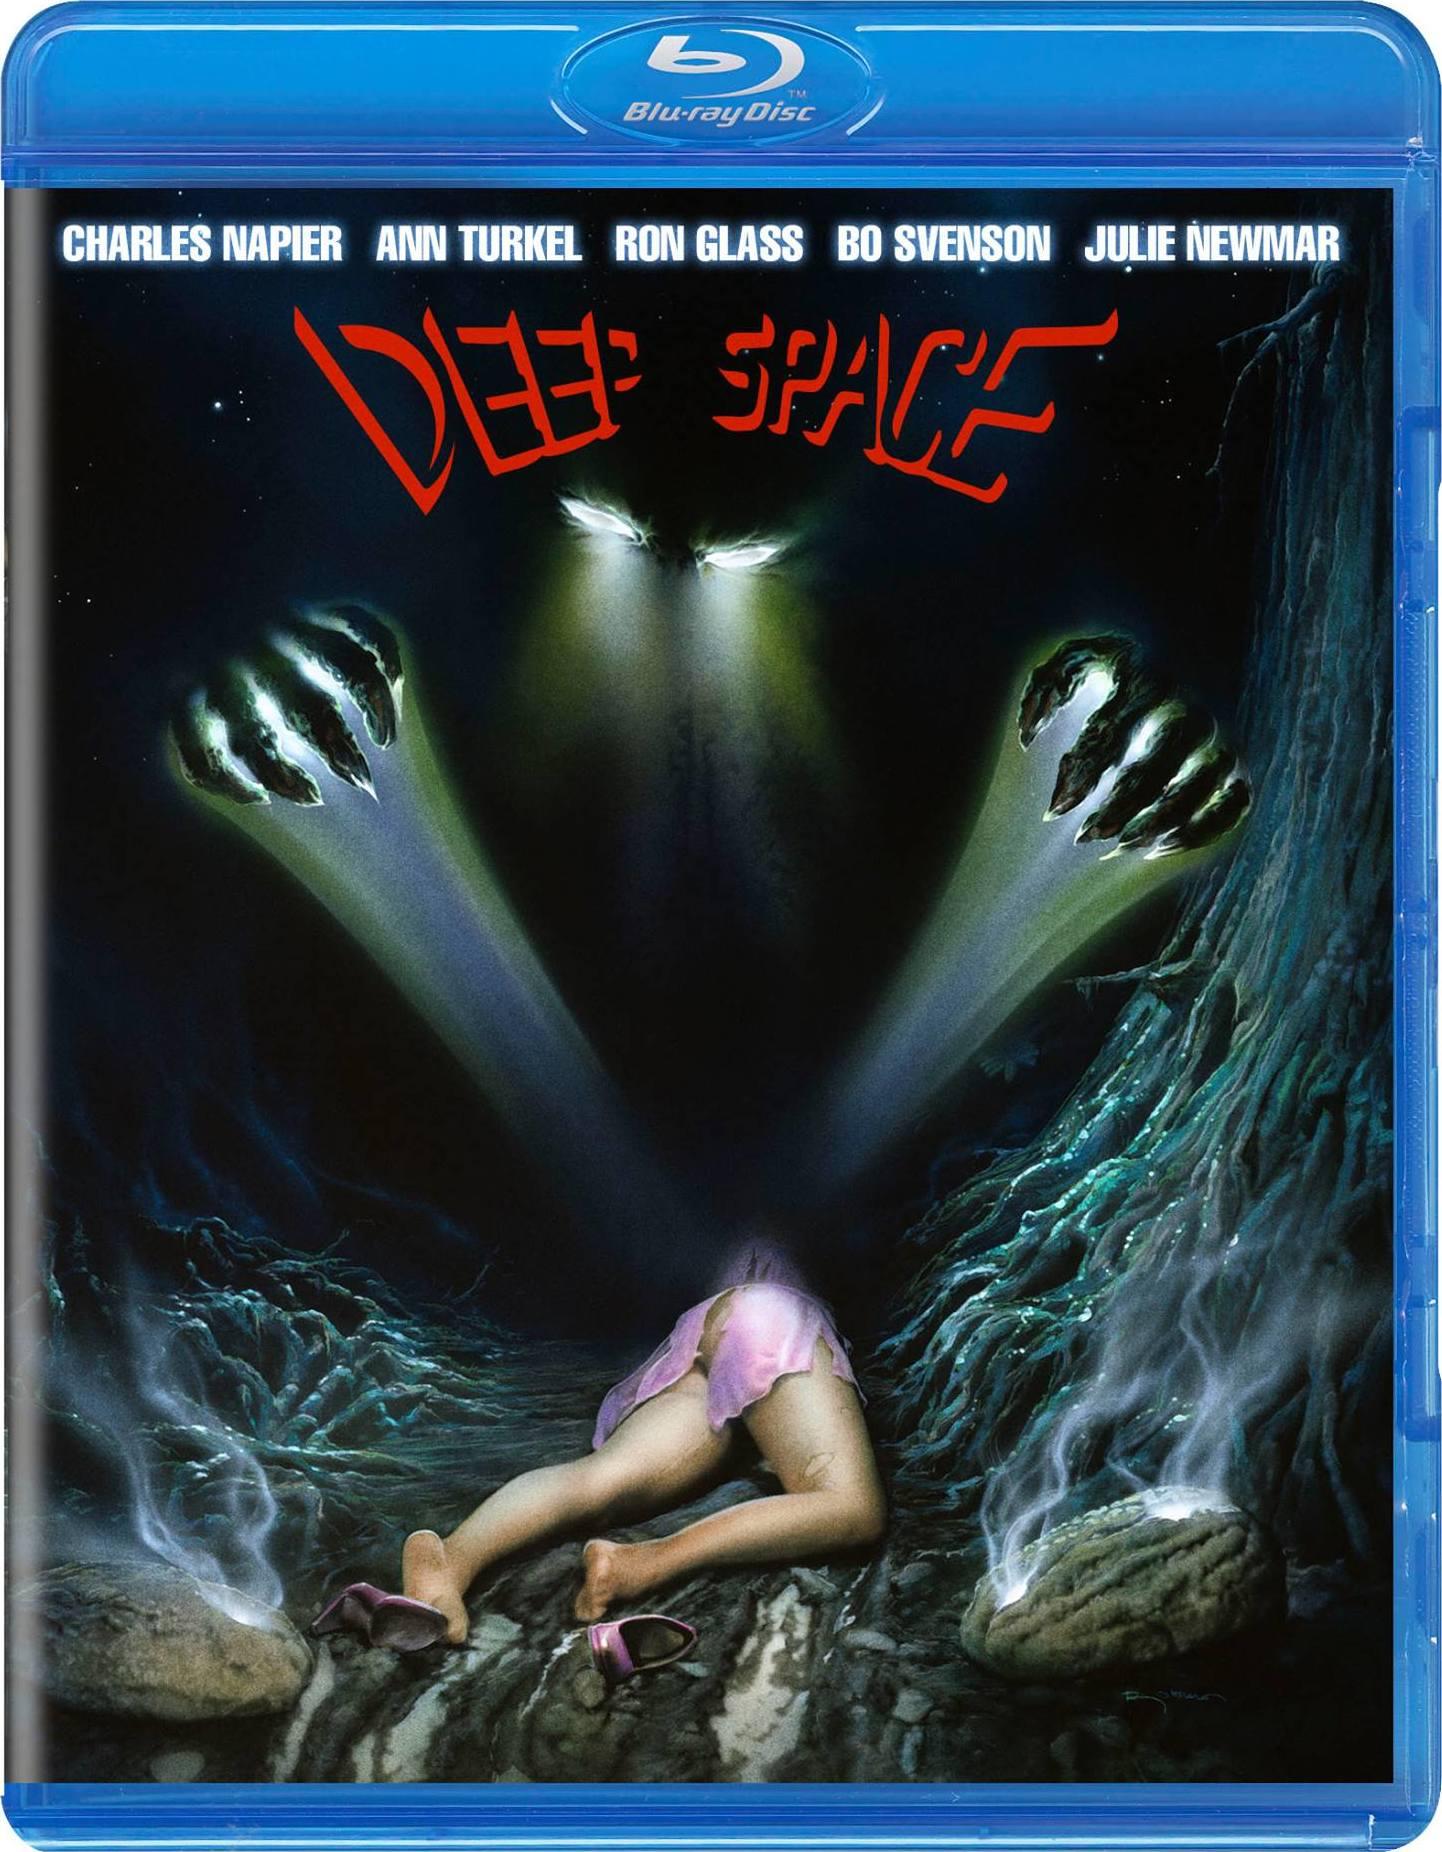 Deep Space (1988)